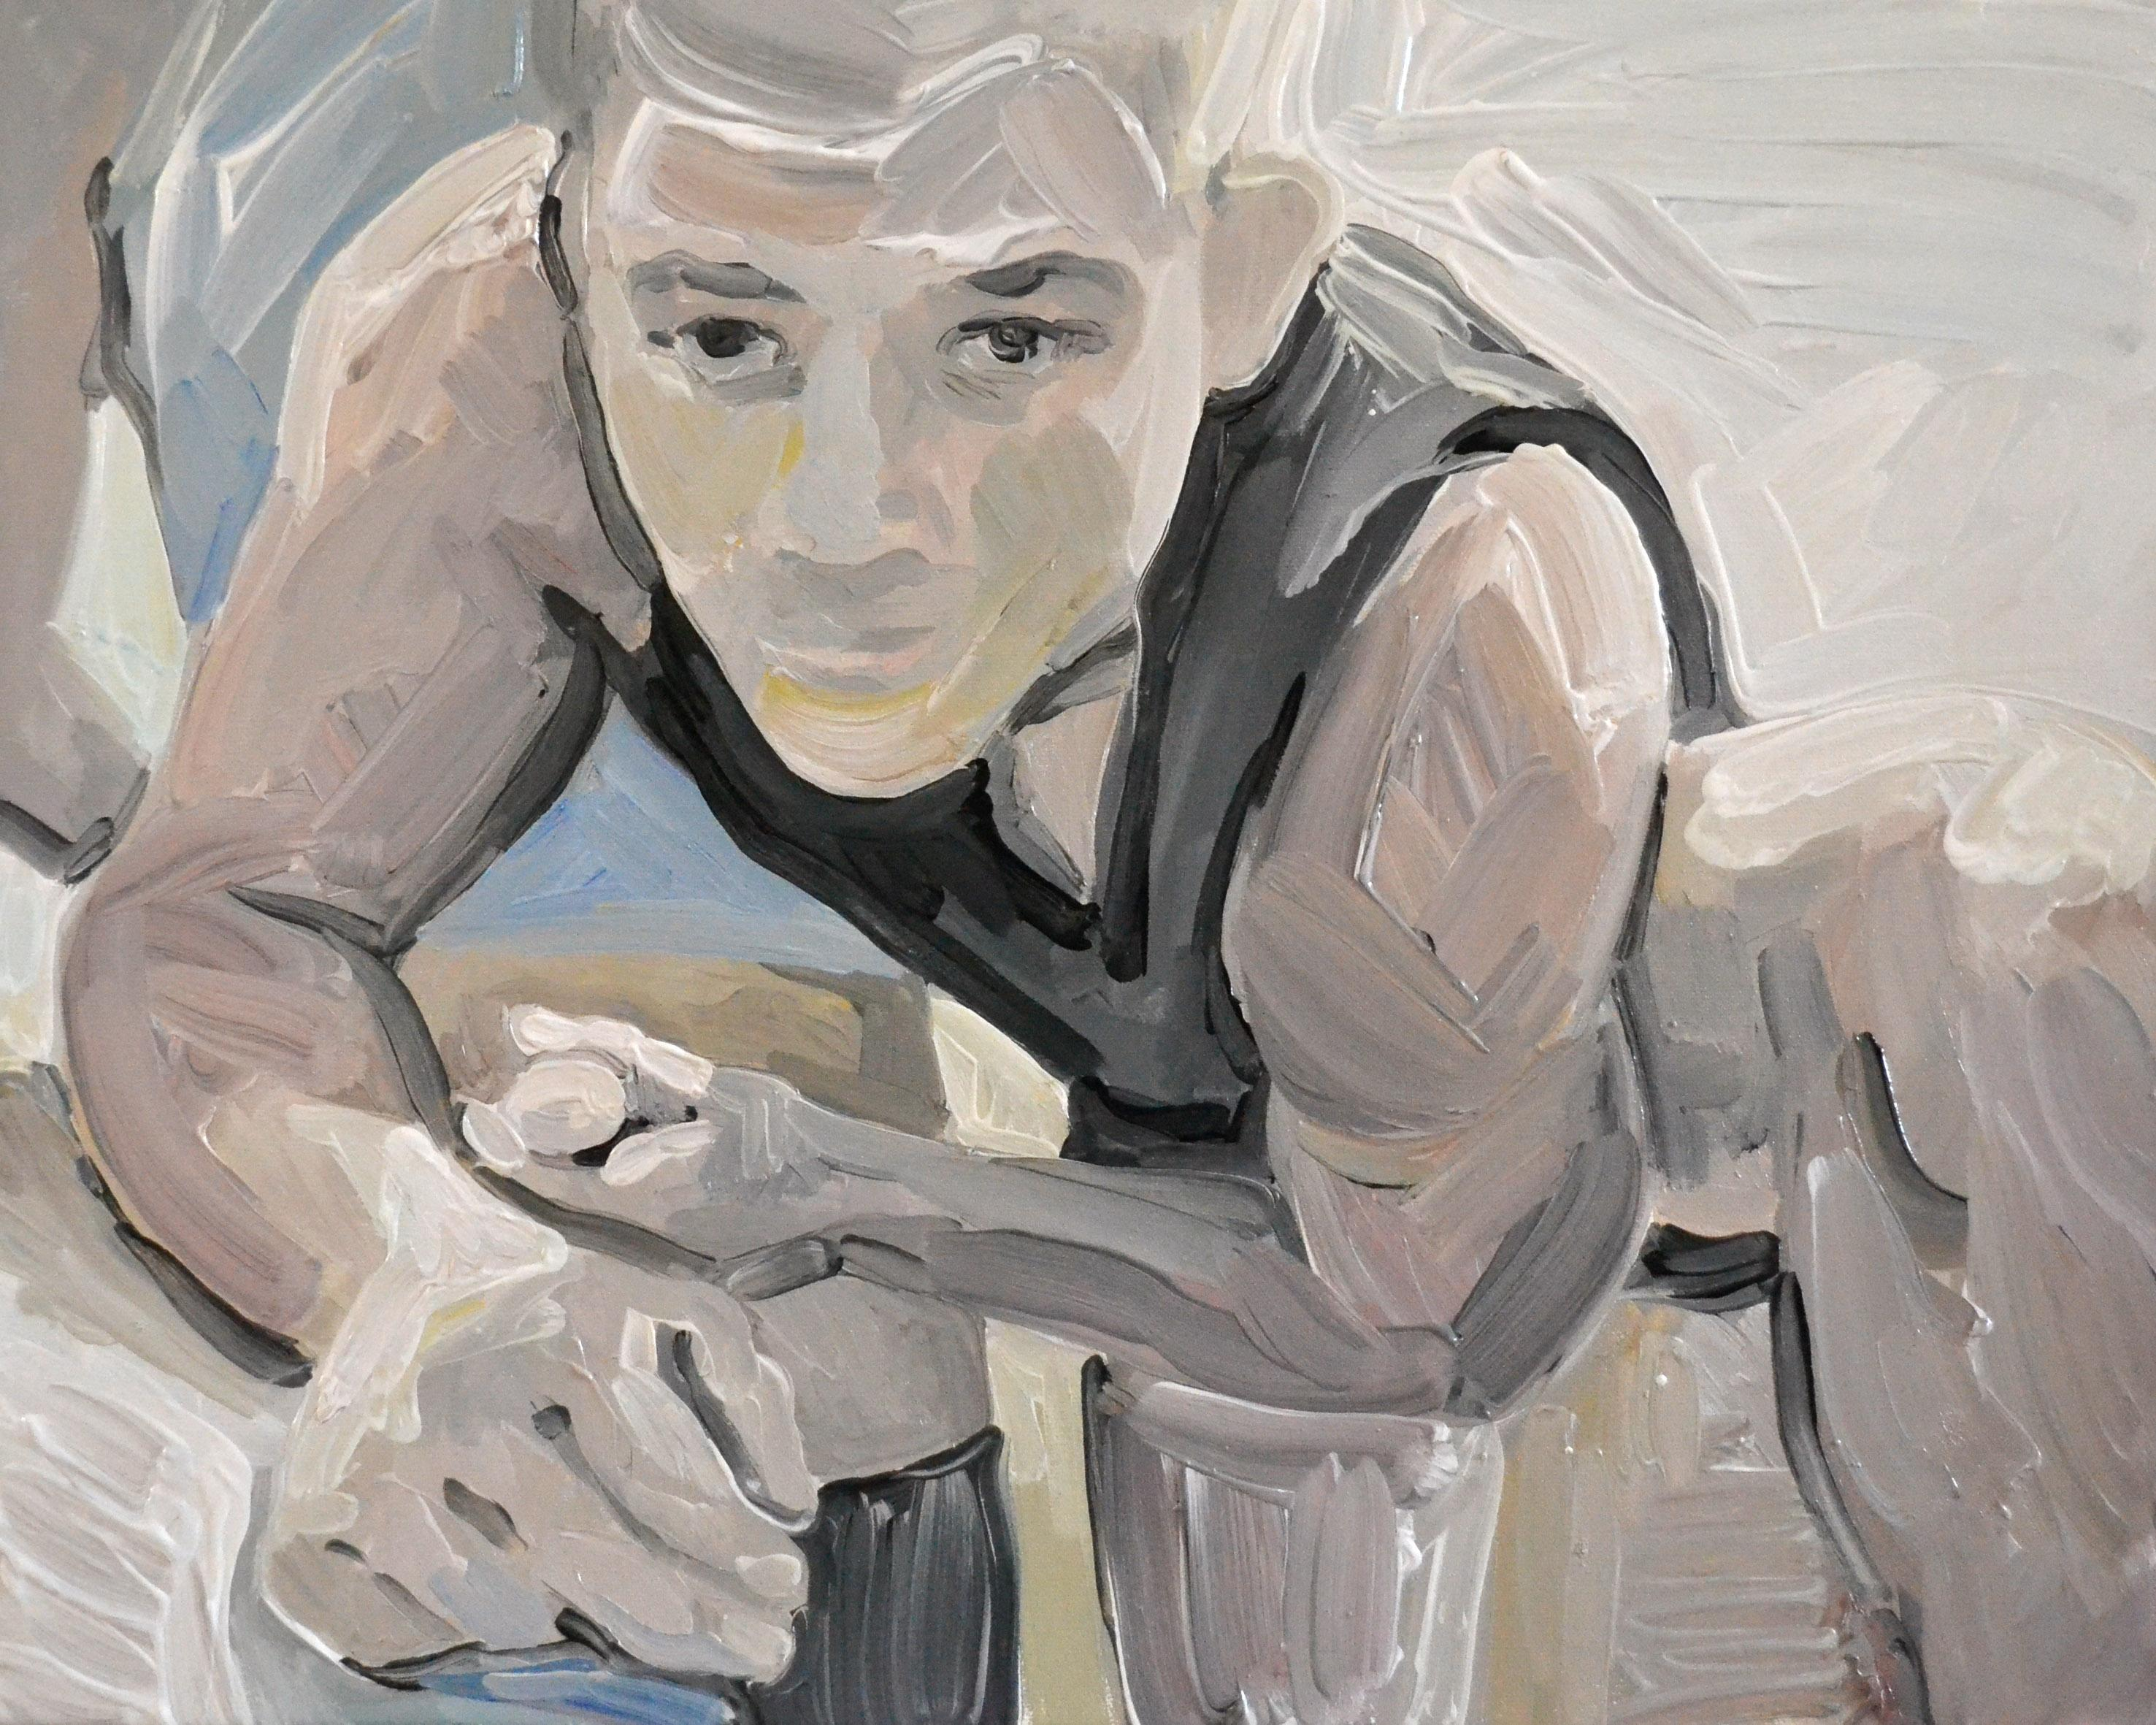 Camera 13 - Contemporary Expressive Figurative Oil Painting, Men Erotic Scenes